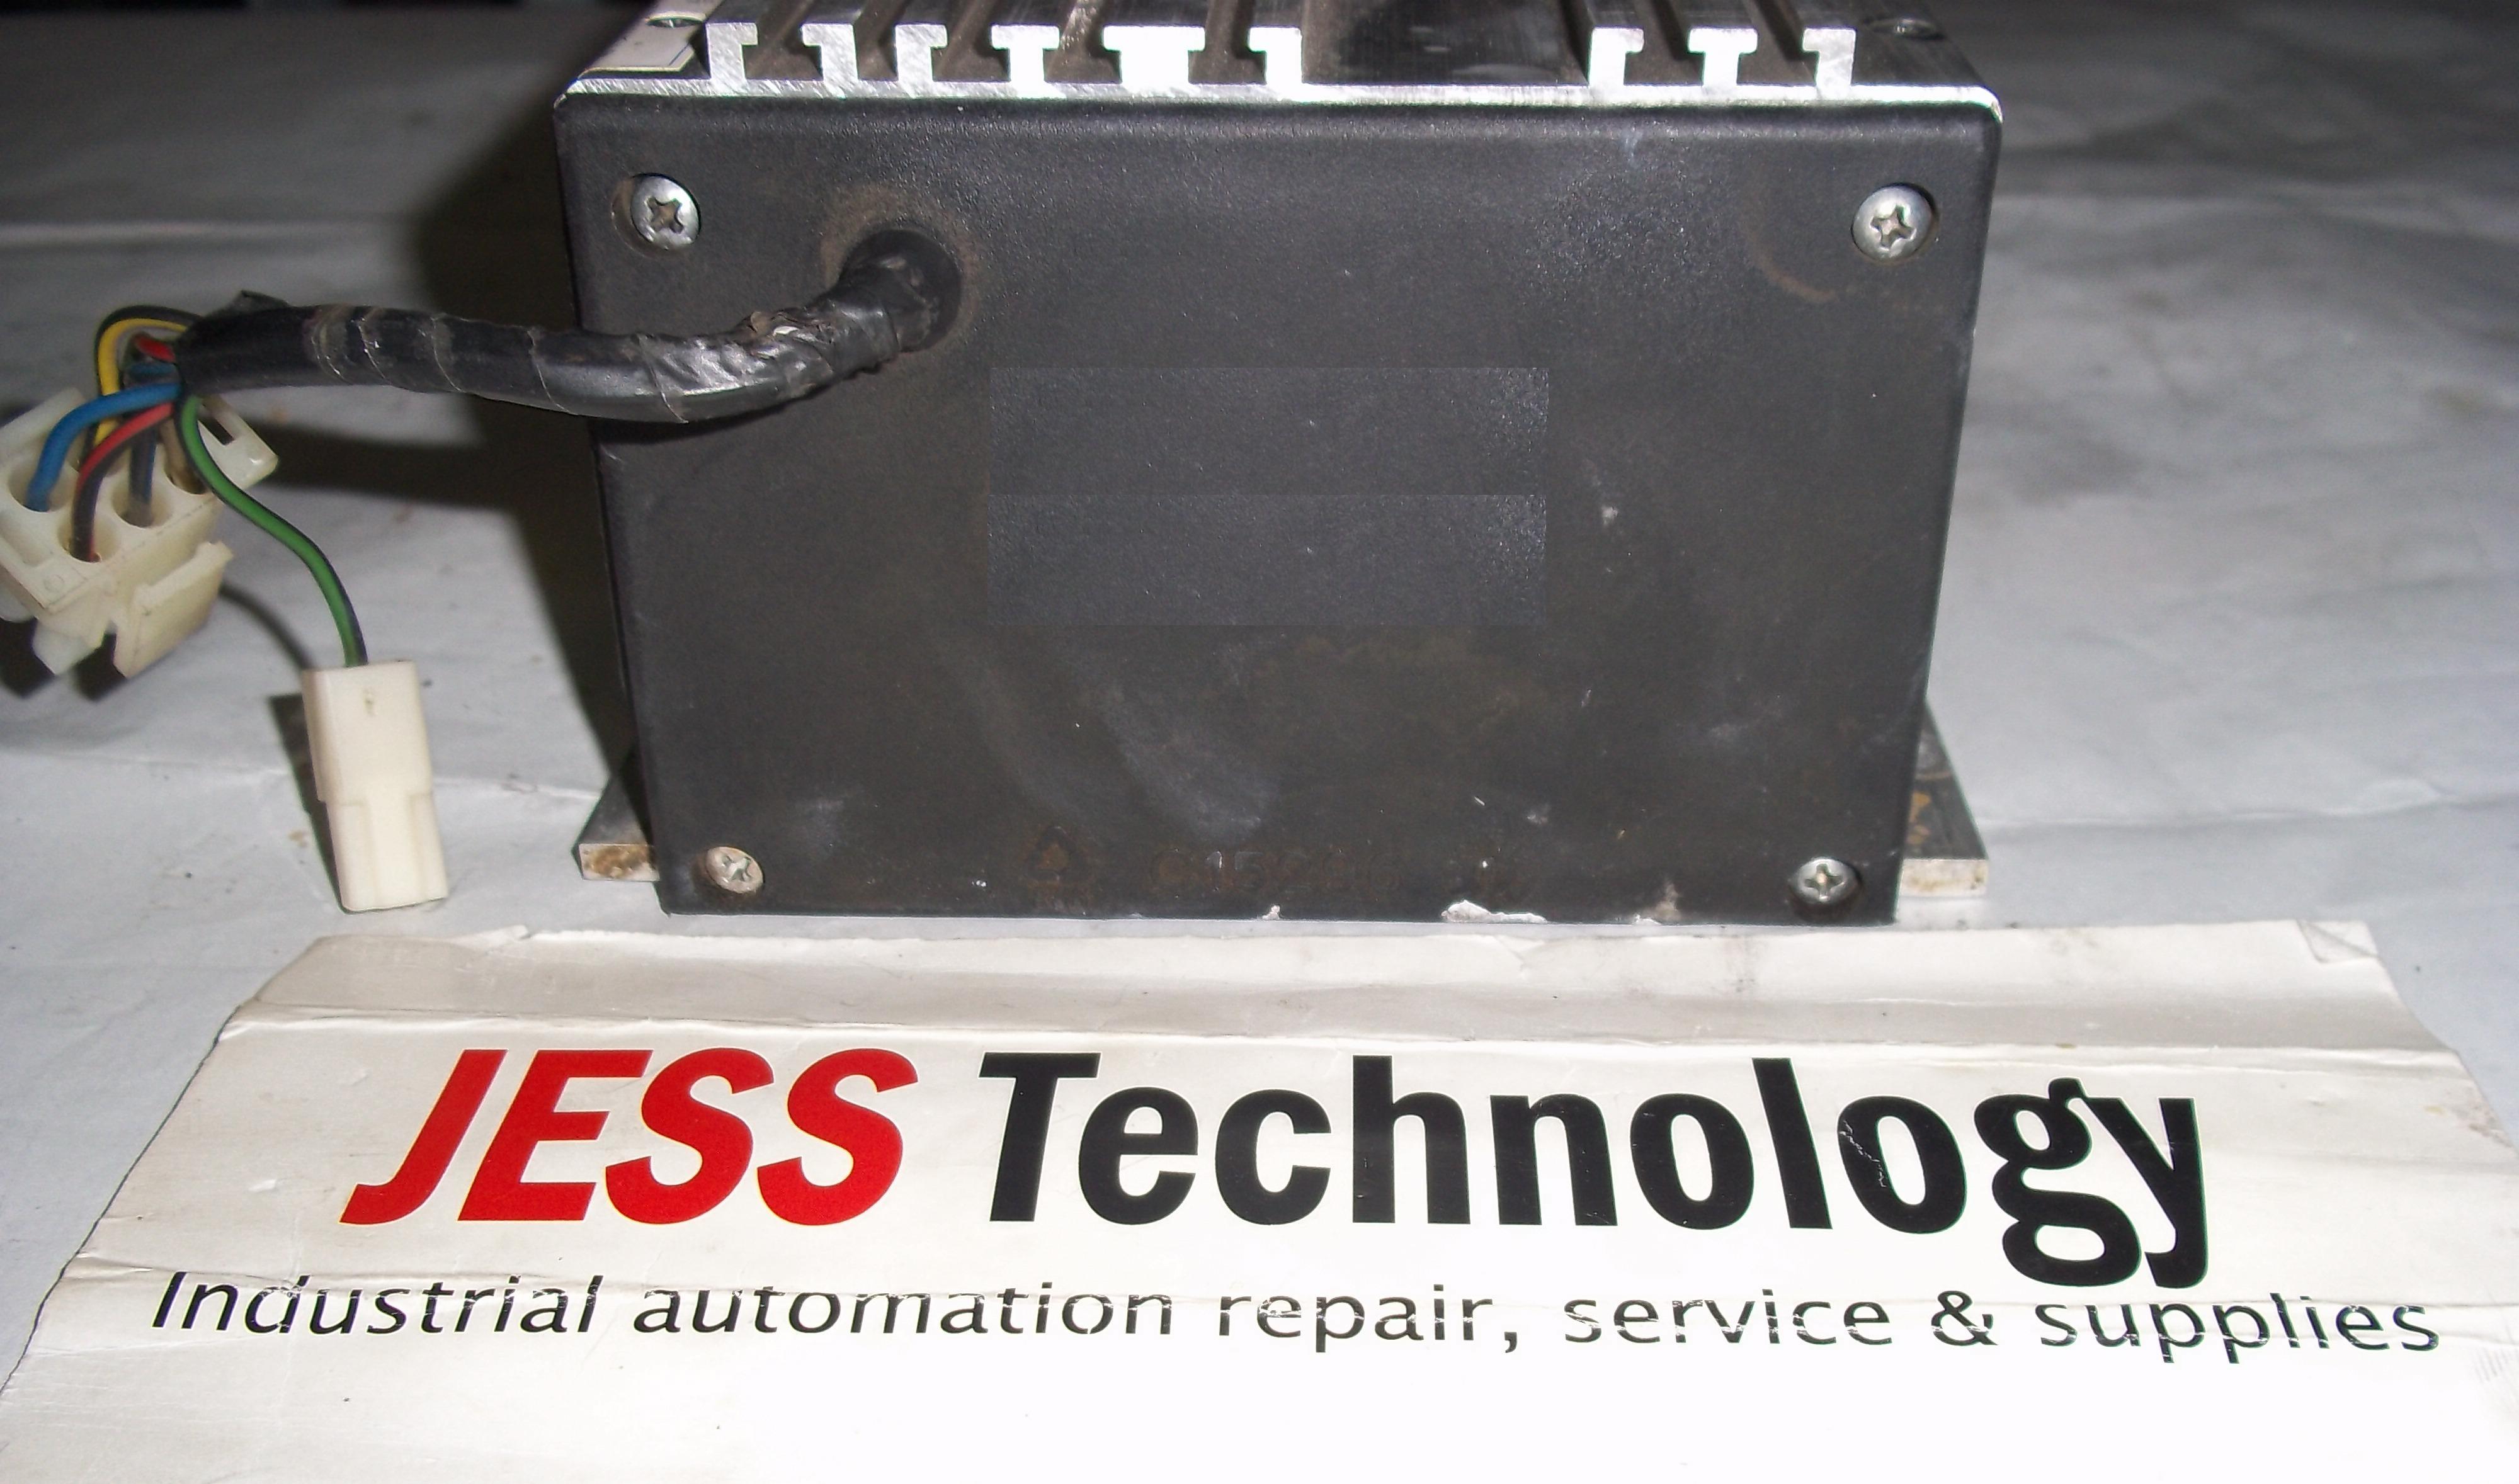 Repair C15296 ZAPI  ZAPI S.P.A (C15296) in Malaysia, Singapore, Thailand, Indonesia